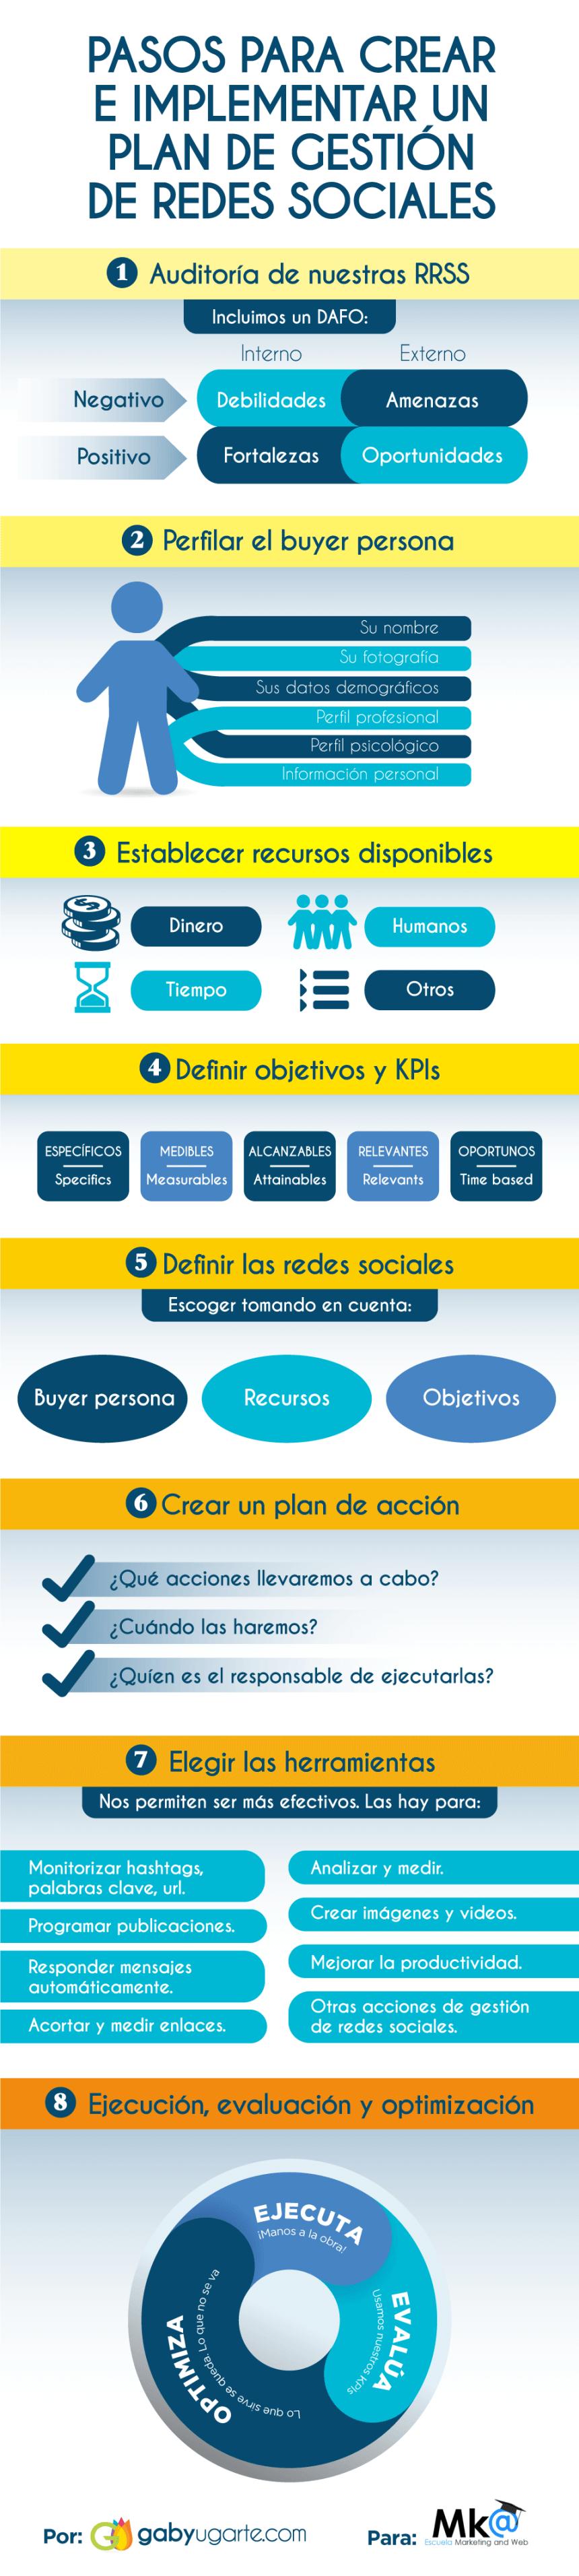 Pasos para crear un Plan de Gestión en Redes Sociales #infografia #infographic #socialmedia